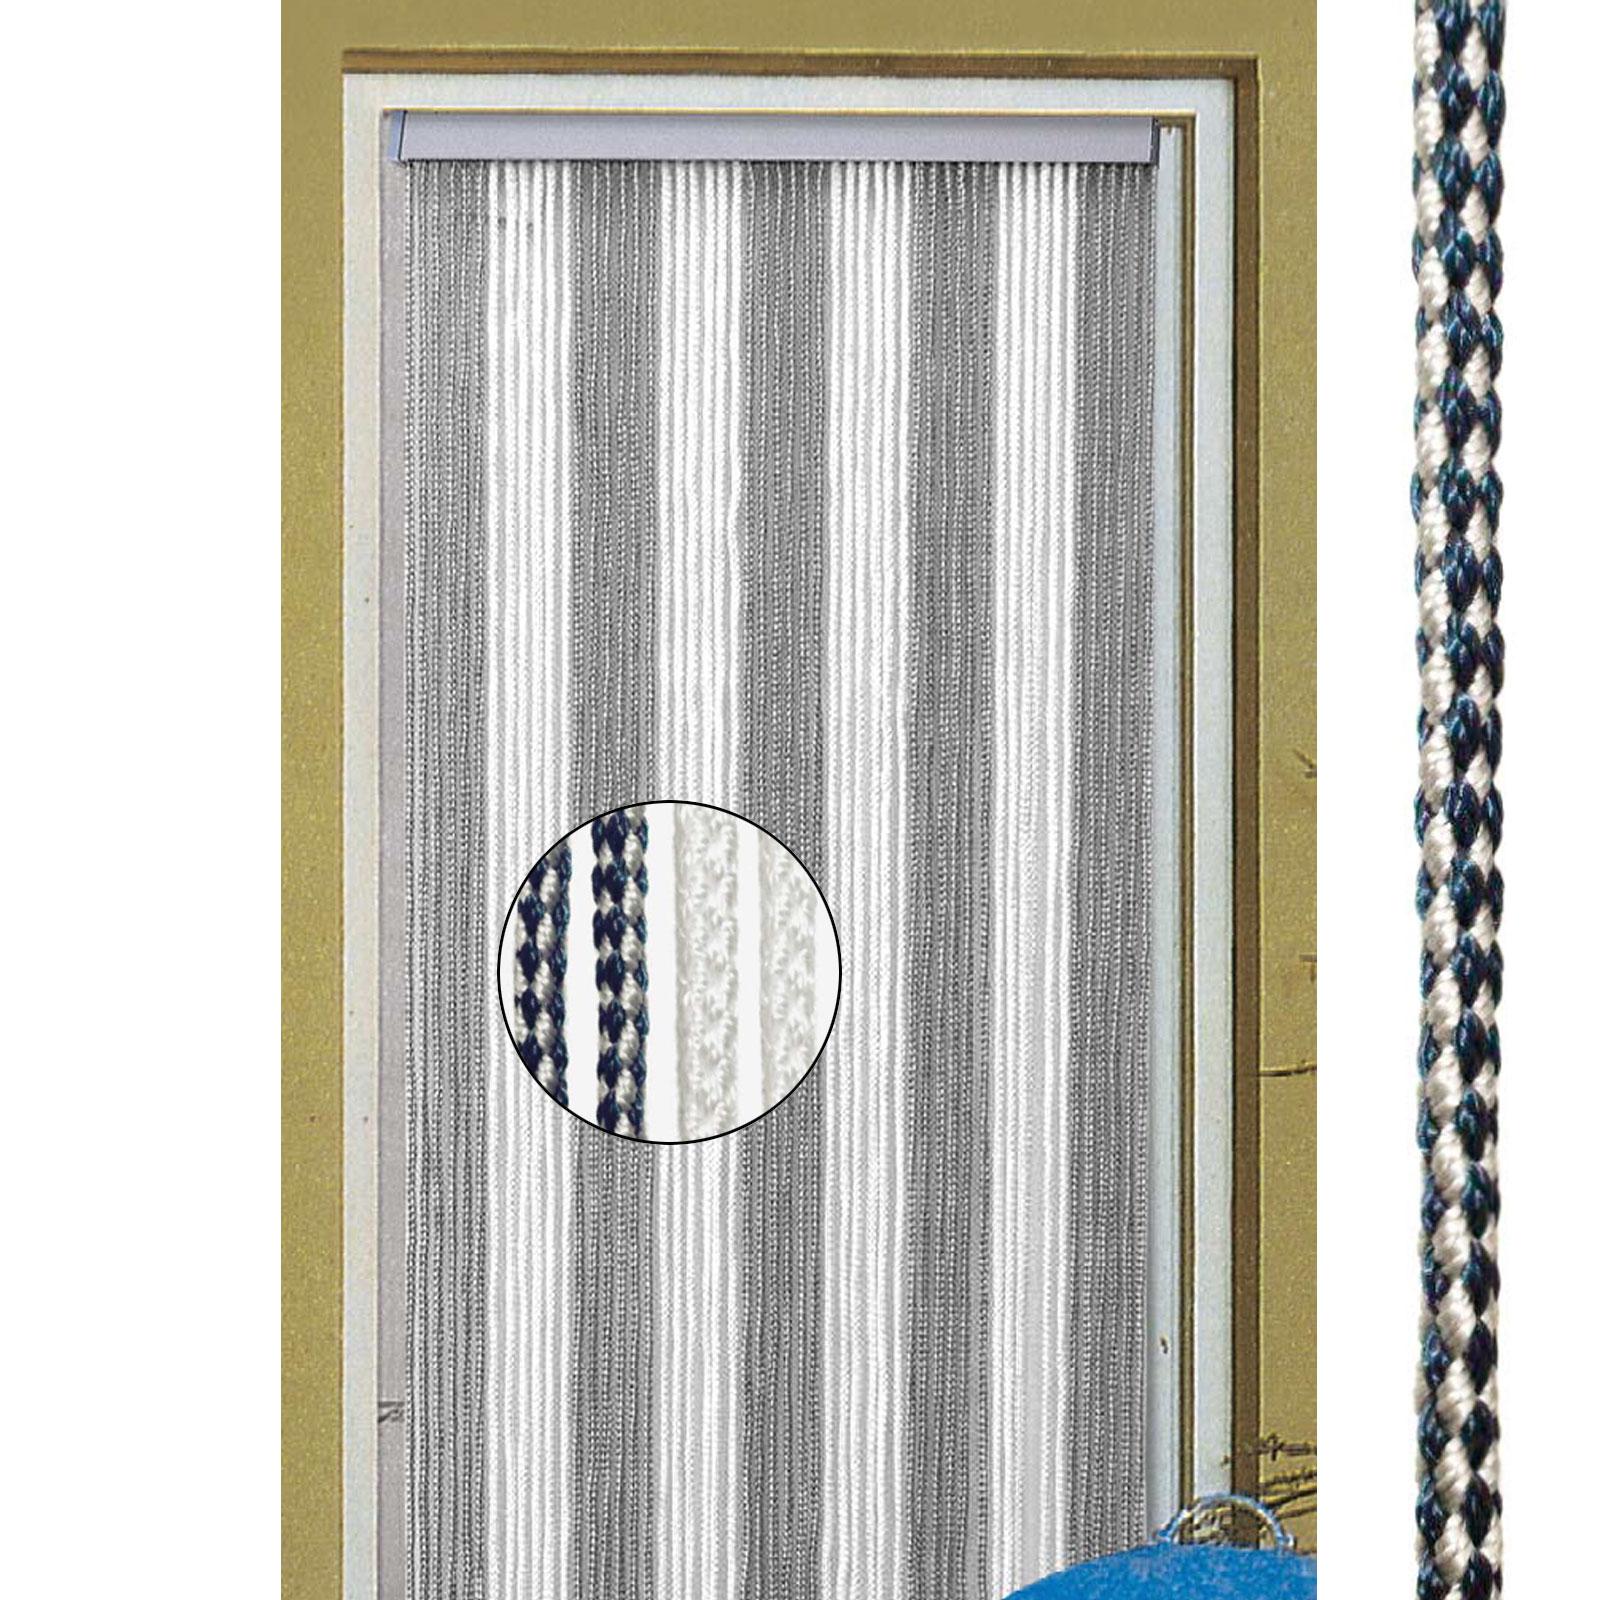 Vorhang Korda, 100% Polyester, 60x190 cm, weiß/blau